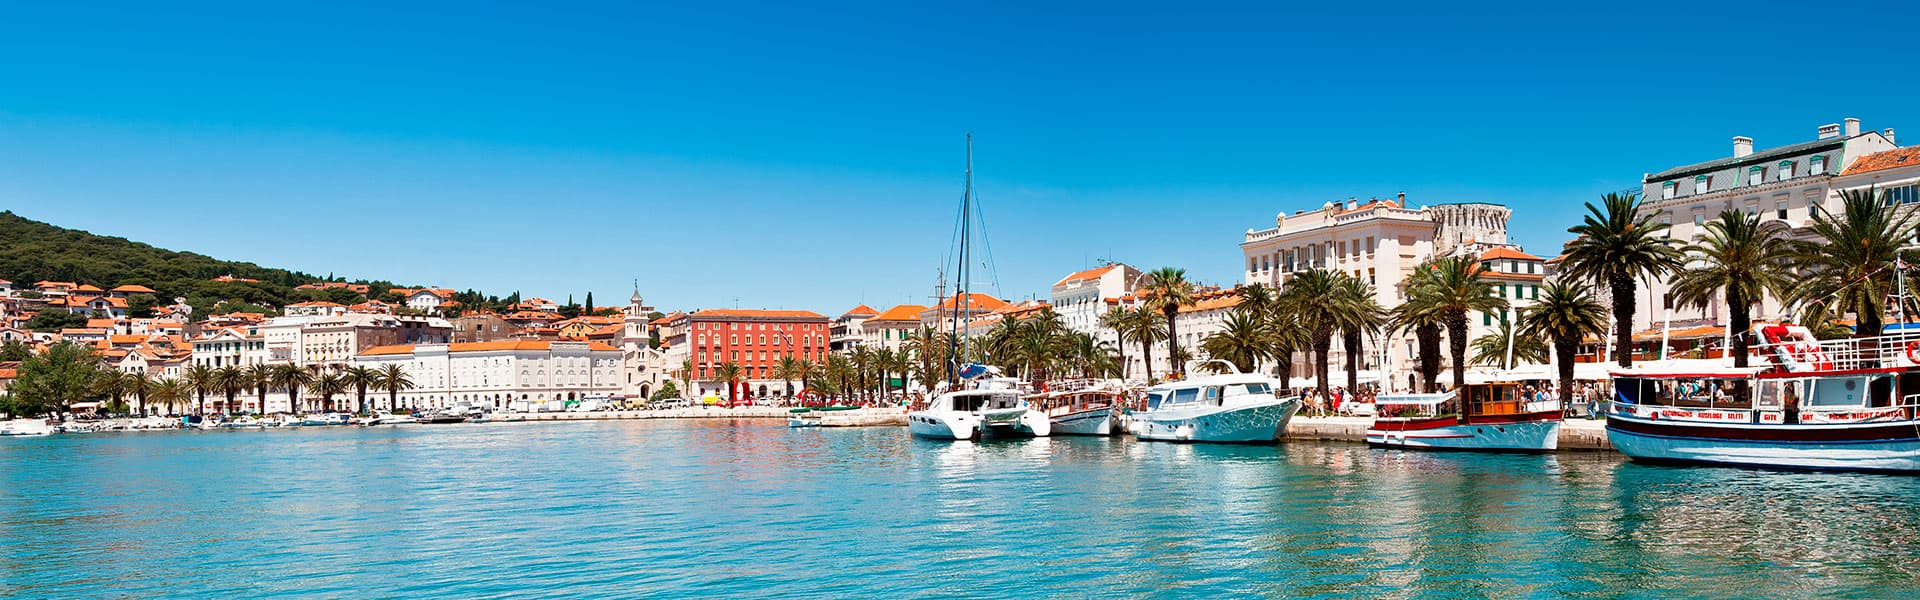 Mittelmeer: Griechenland, Kroatien und Montenegro